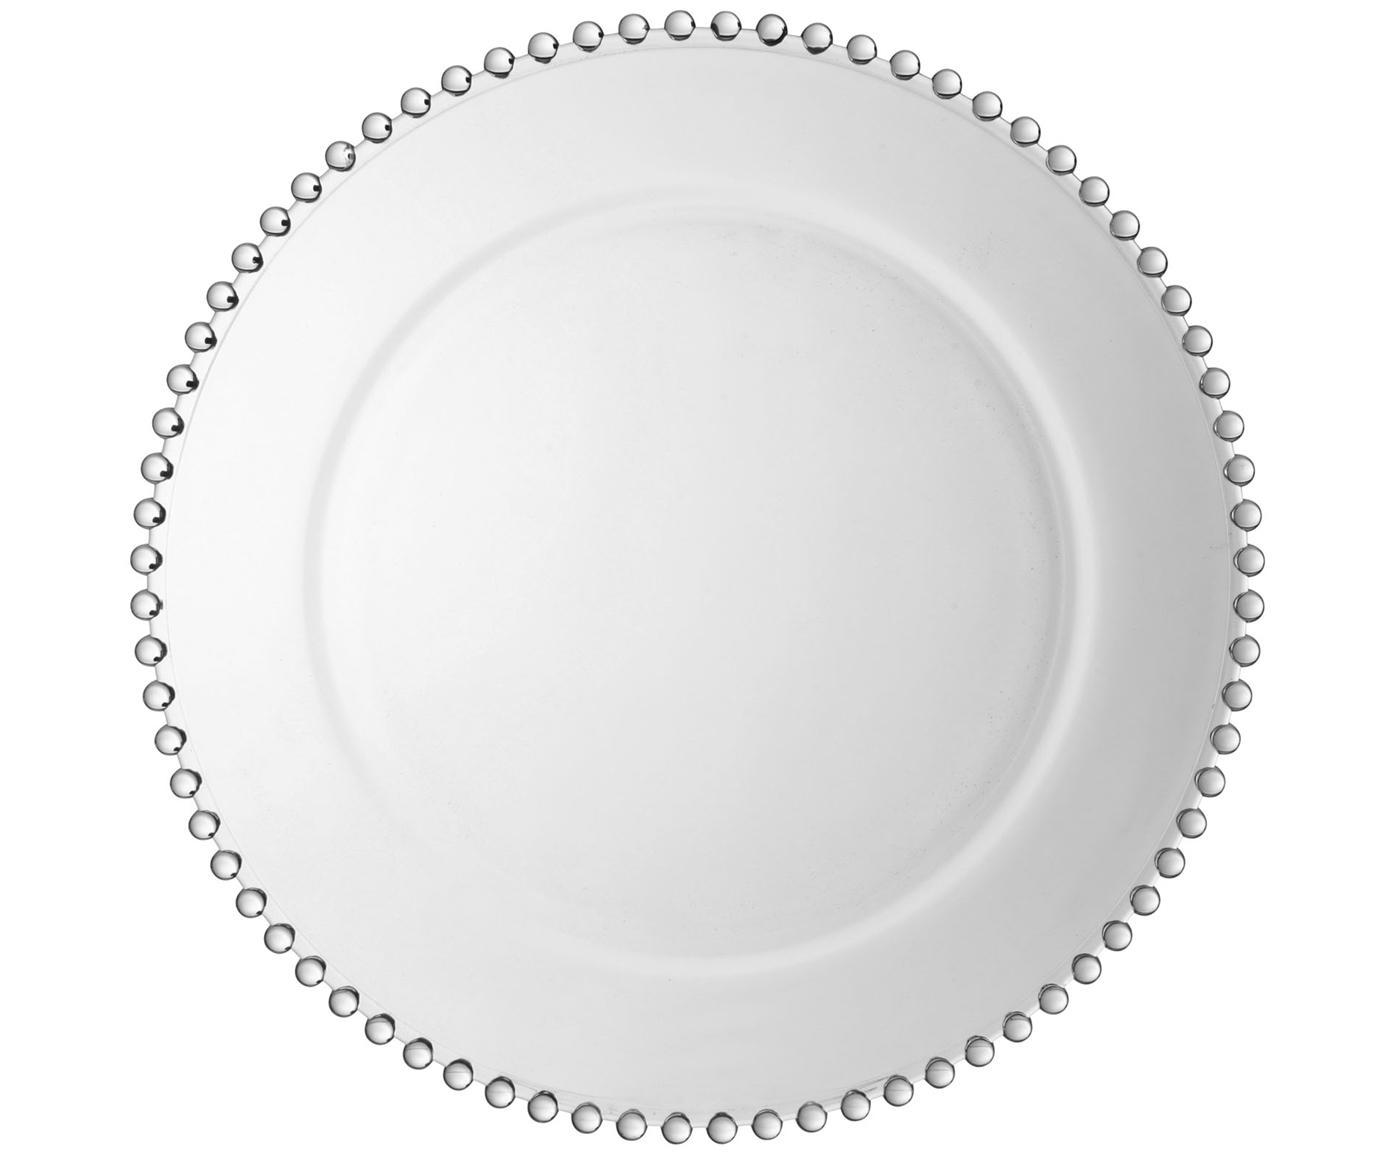 Platzteller Perles, Glas, Transparent, Ø 33 cm